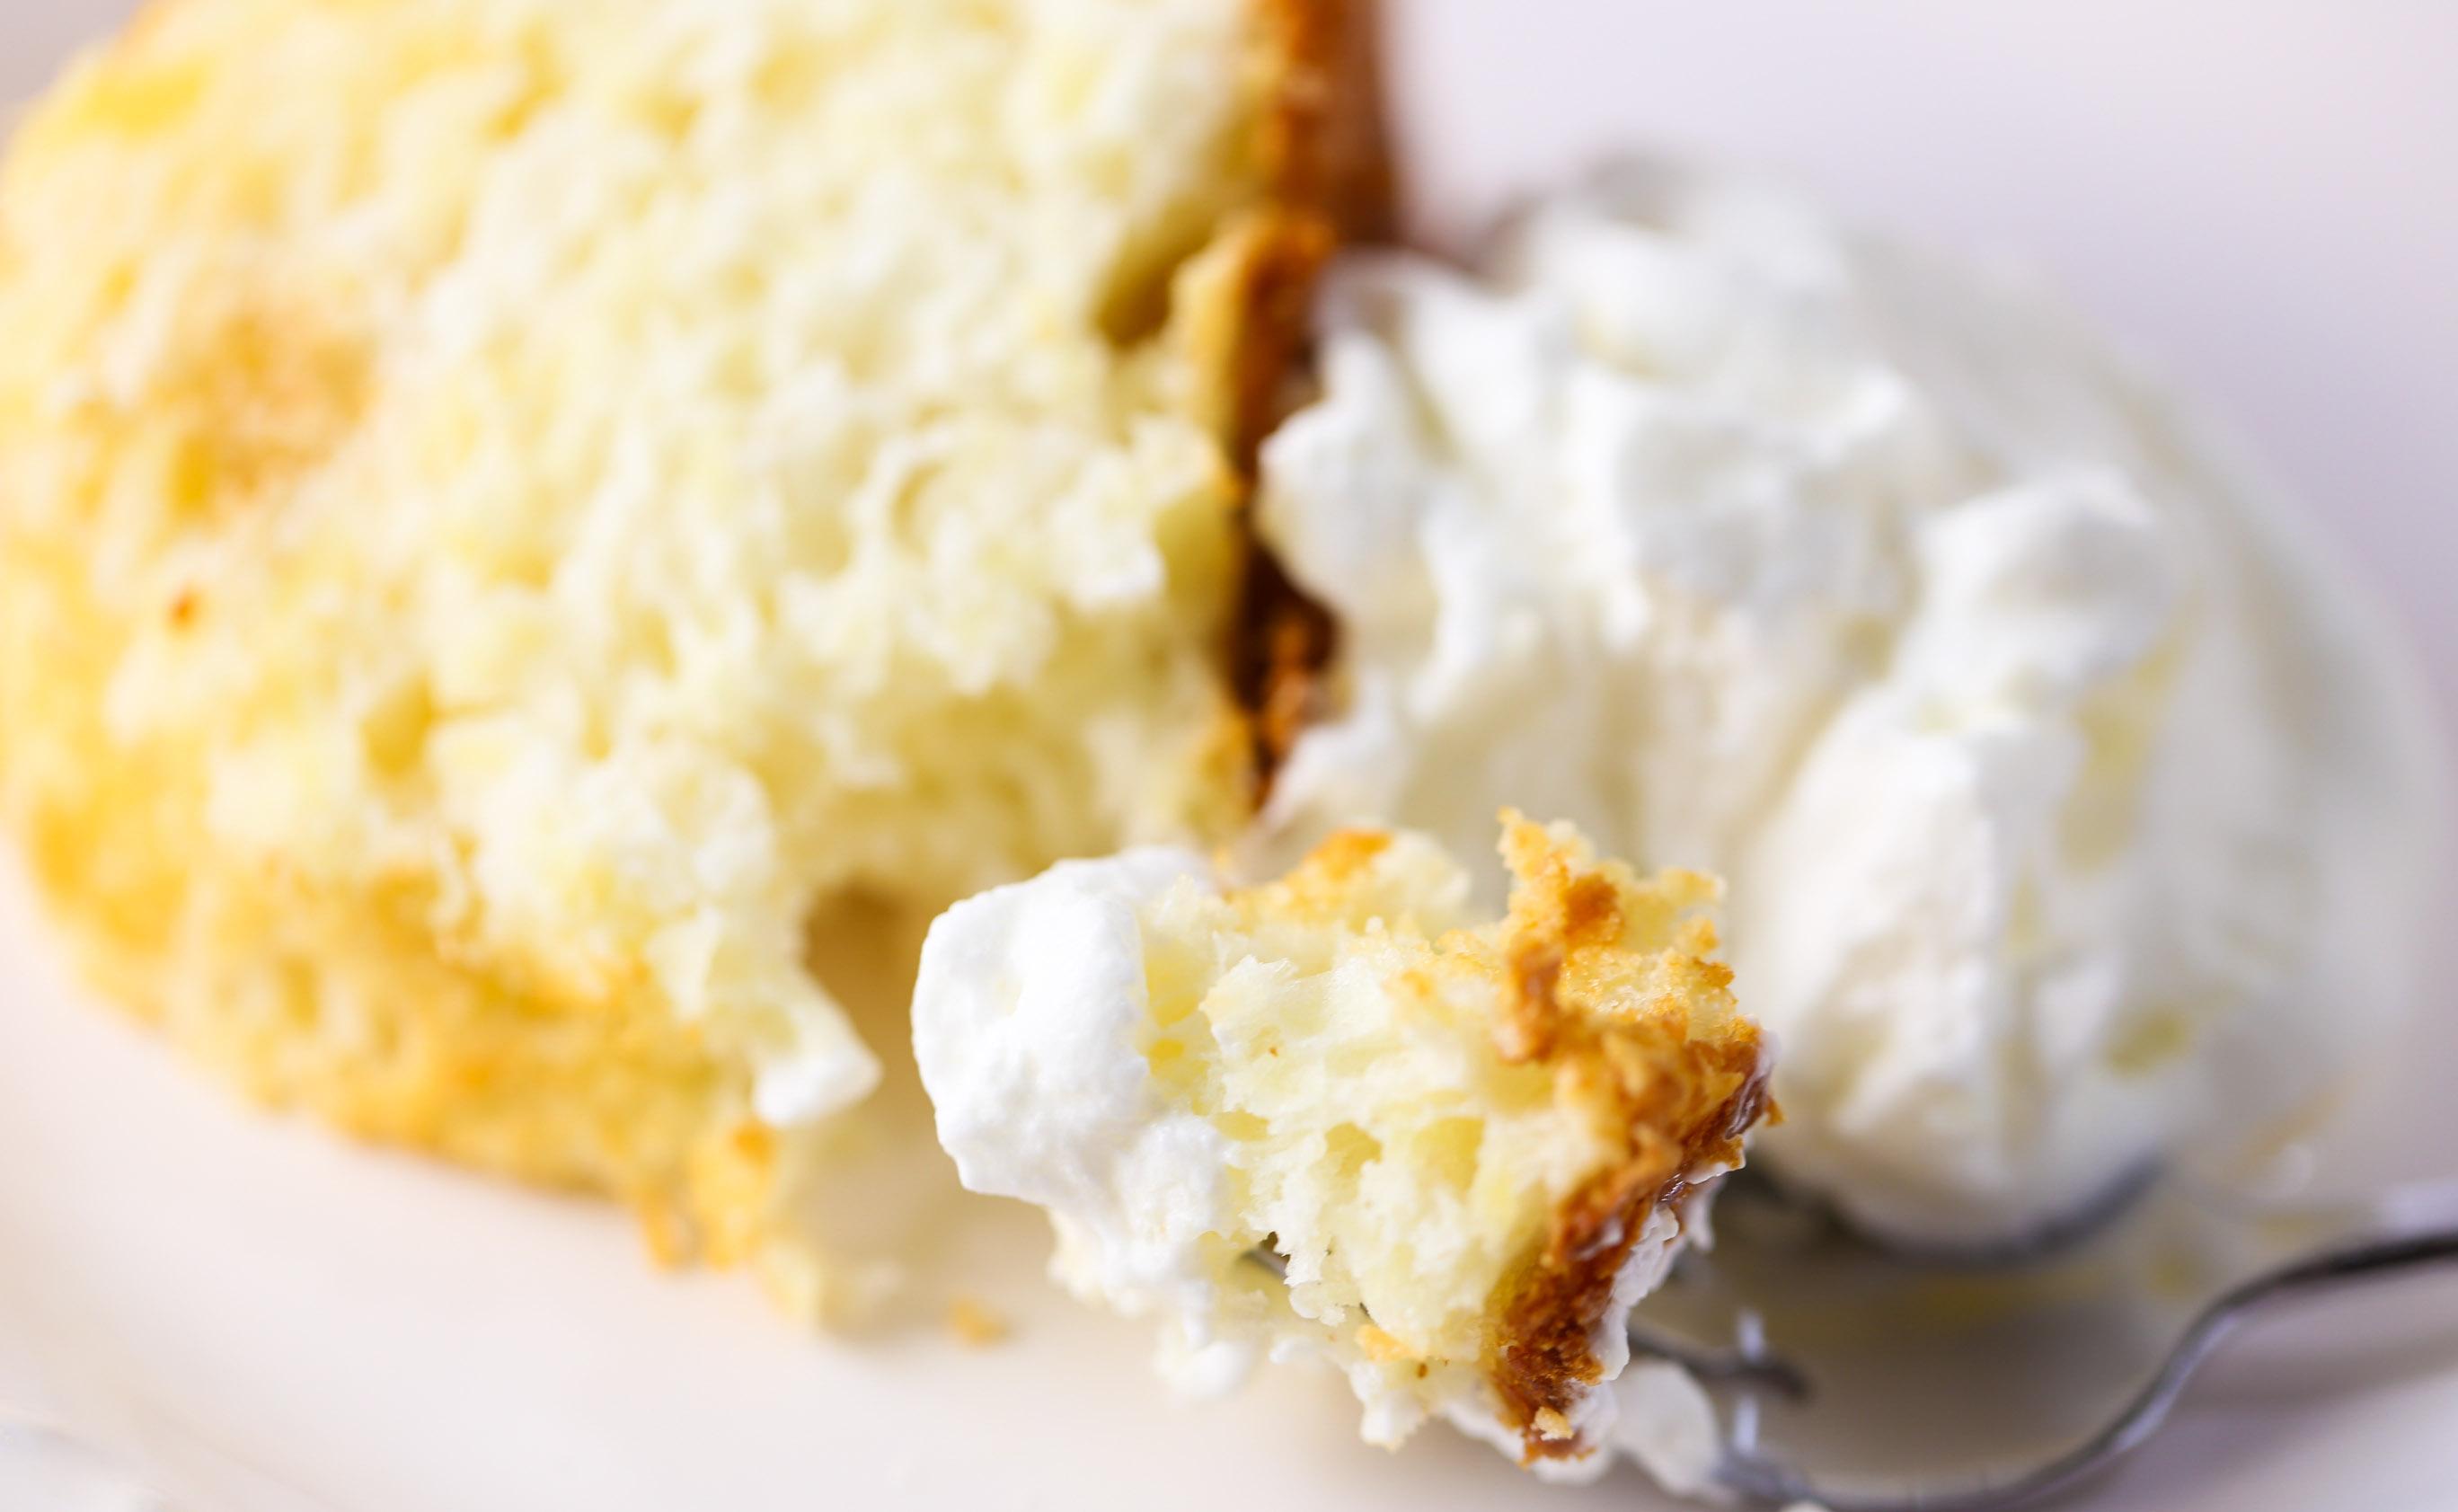 Pineapple Tidbits And Angel Food Cake